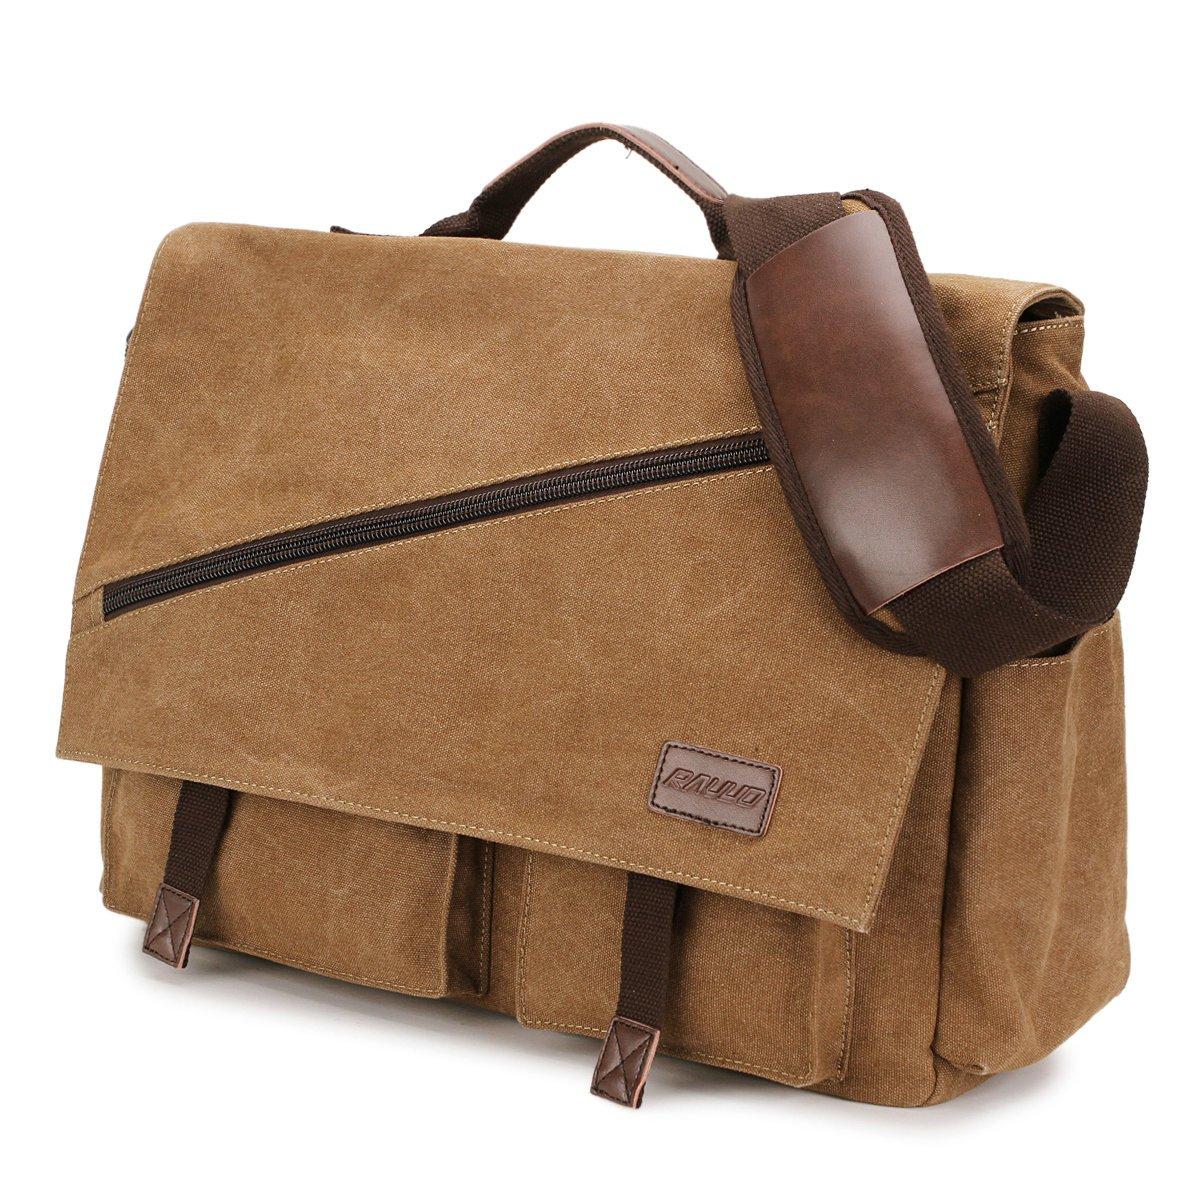 Canvas Messenger Bag,17.3 Inch Mens Satchel Water Resistant Laptop Briefcase Canvas Vintage Shoulder Crossbody Bag for Men by RAVUO